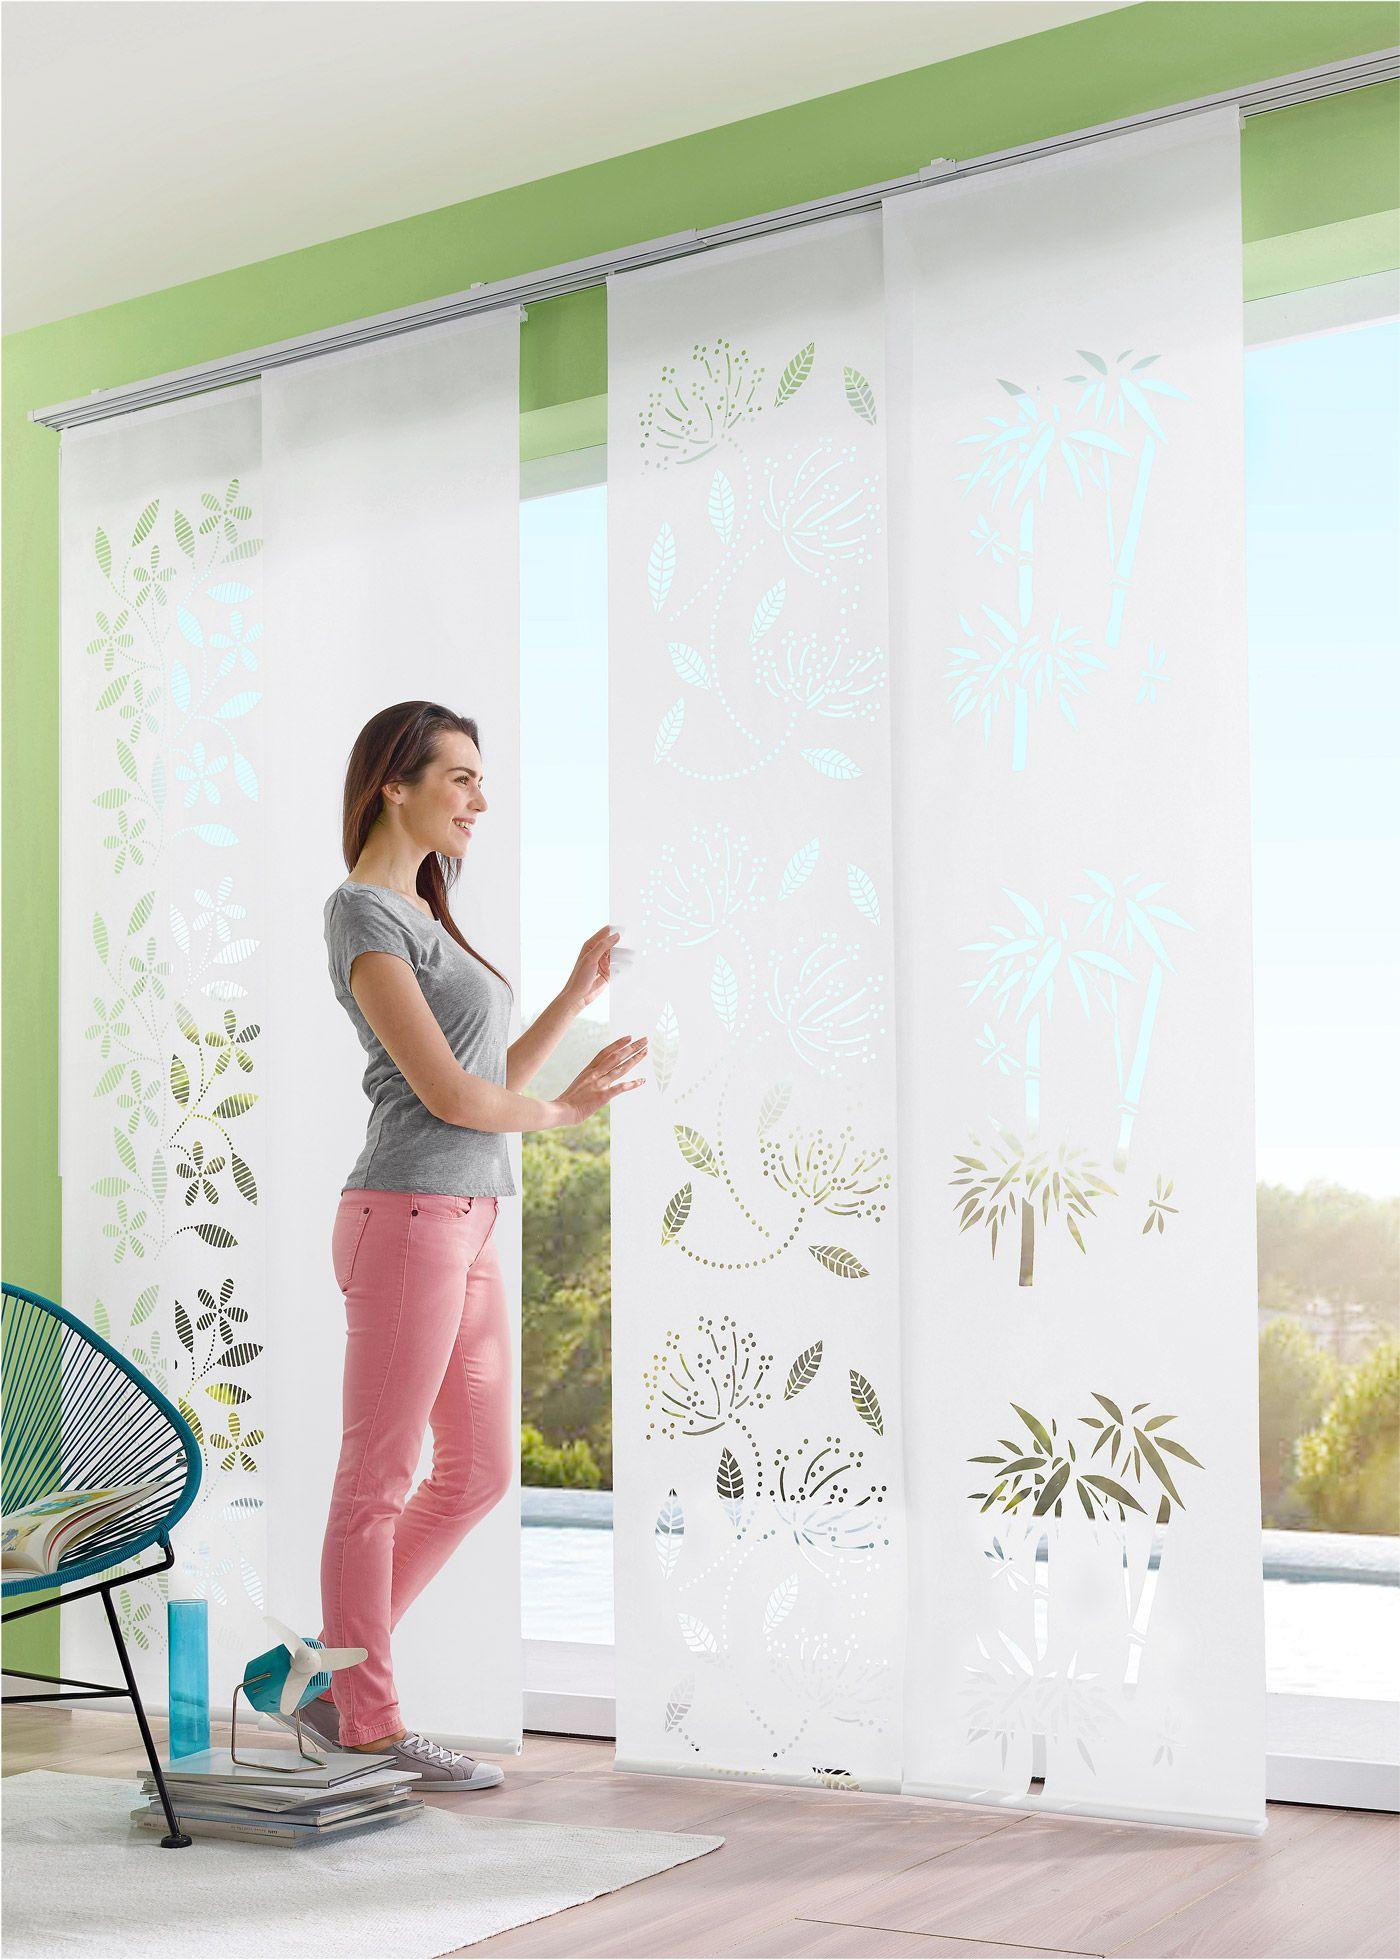 Len Schienensystem Ikea schiebegardinen befestigung wand dekoration ideen